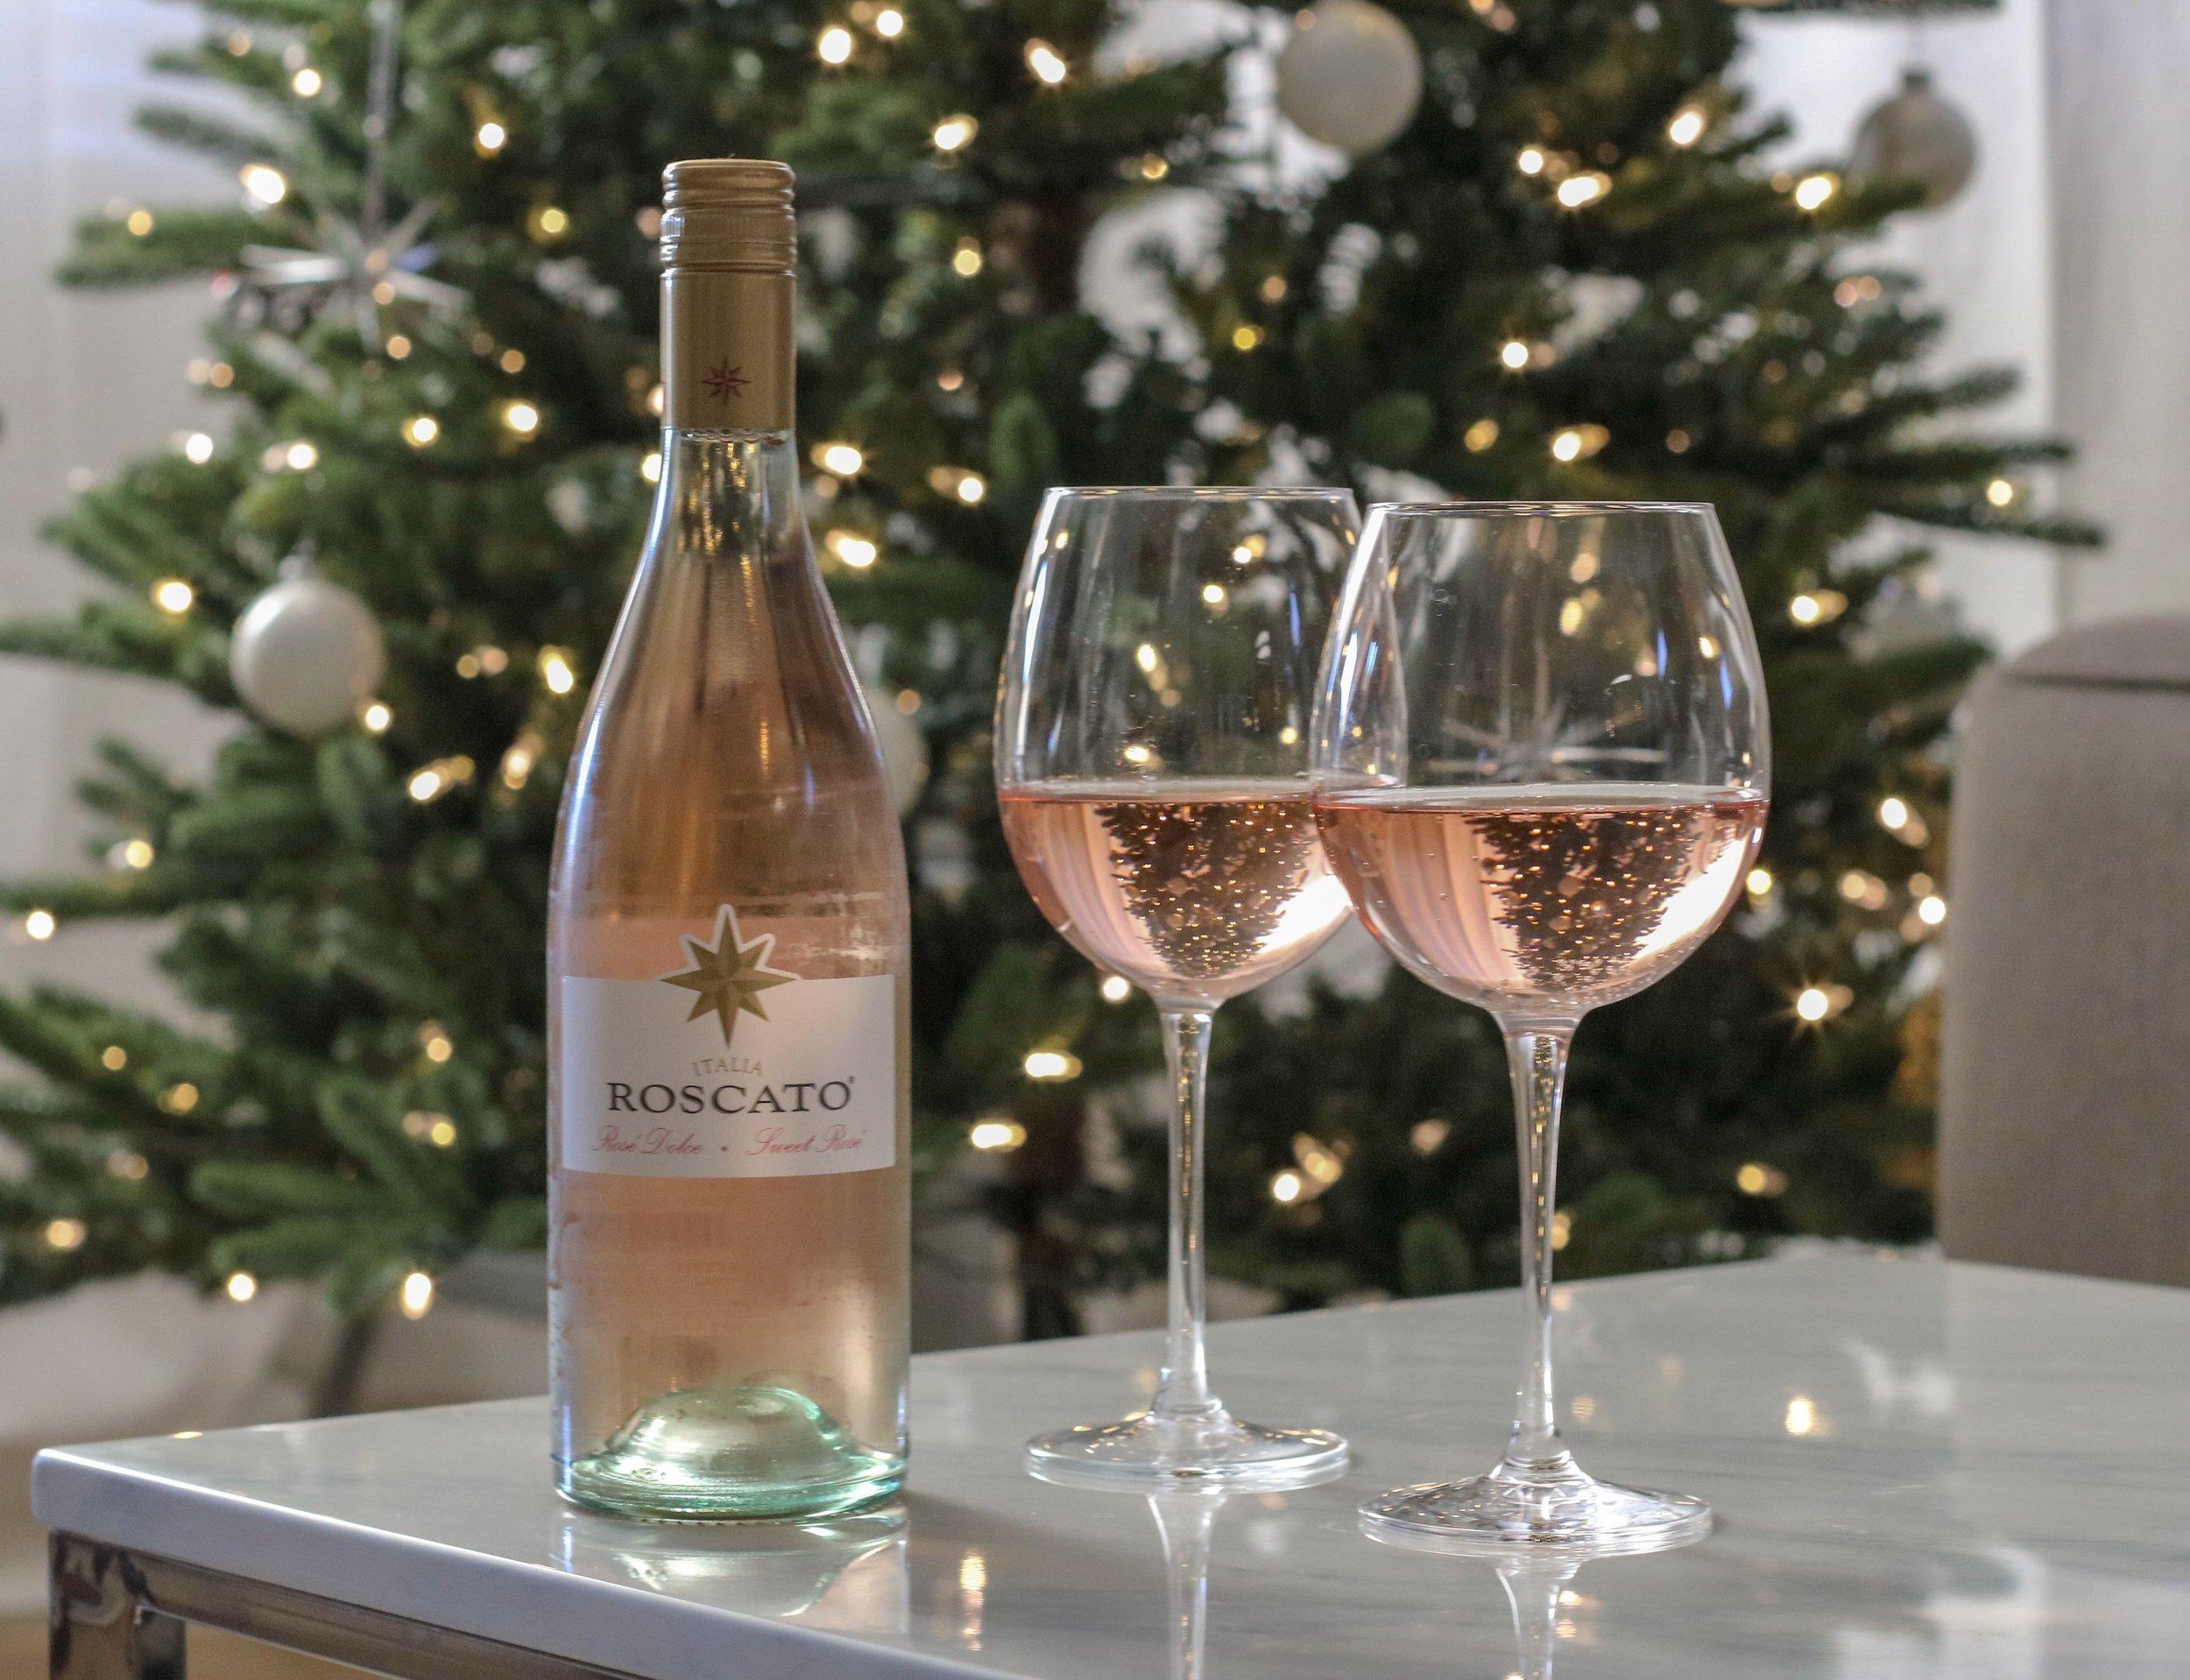 roscato-rose-sweeten-up-the-holidays-6.jpg